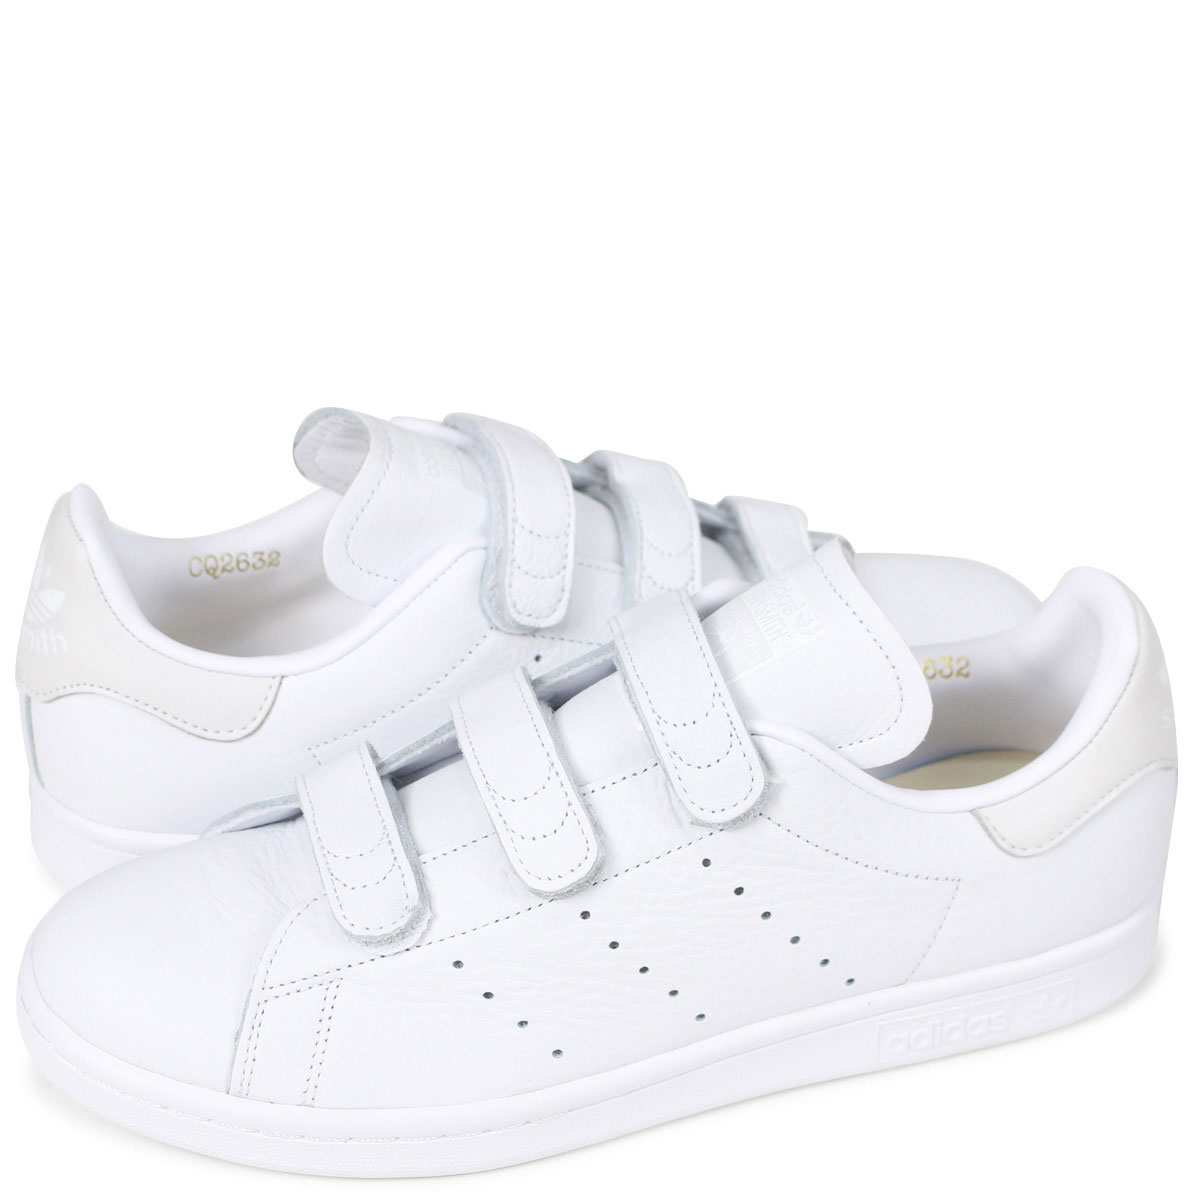 stan smith all white - 65% remise